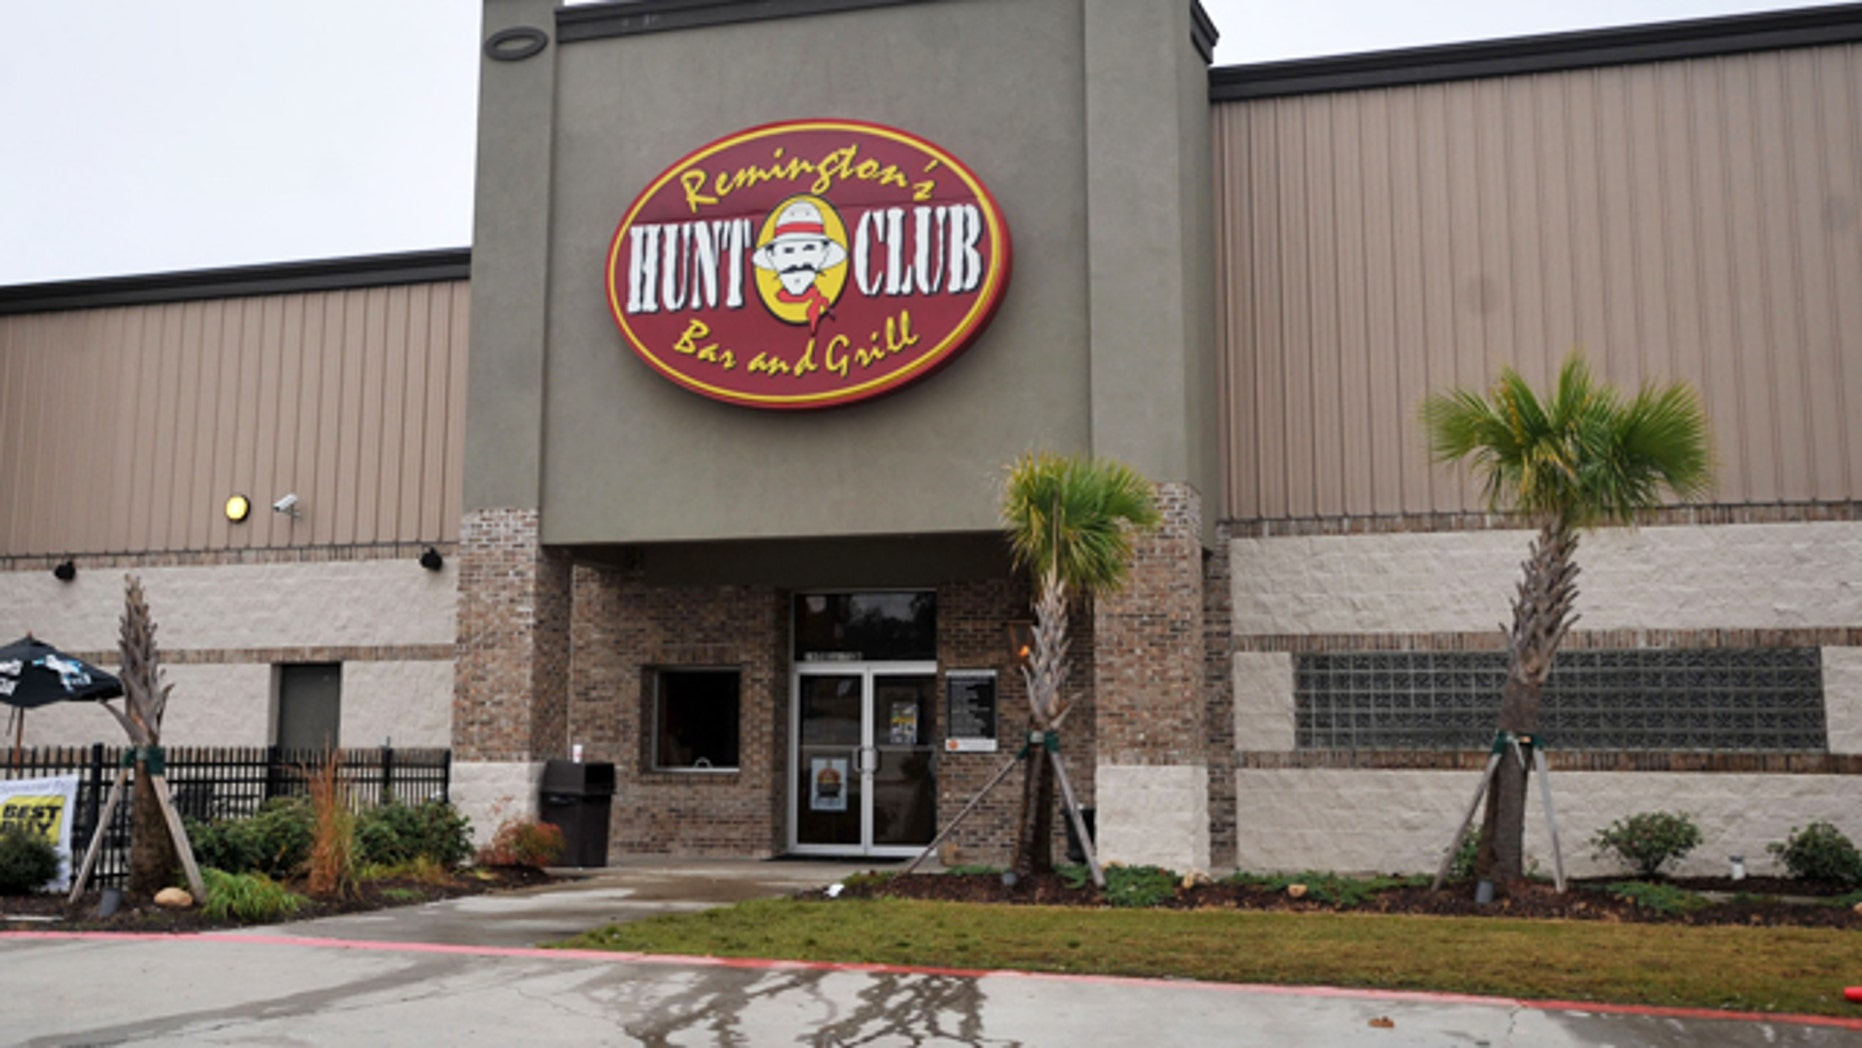 Martez Smith and Tim Green and defensive end Deddrick Jones were shot at Remington's Hunt Club in Hattiesburg, Miss.